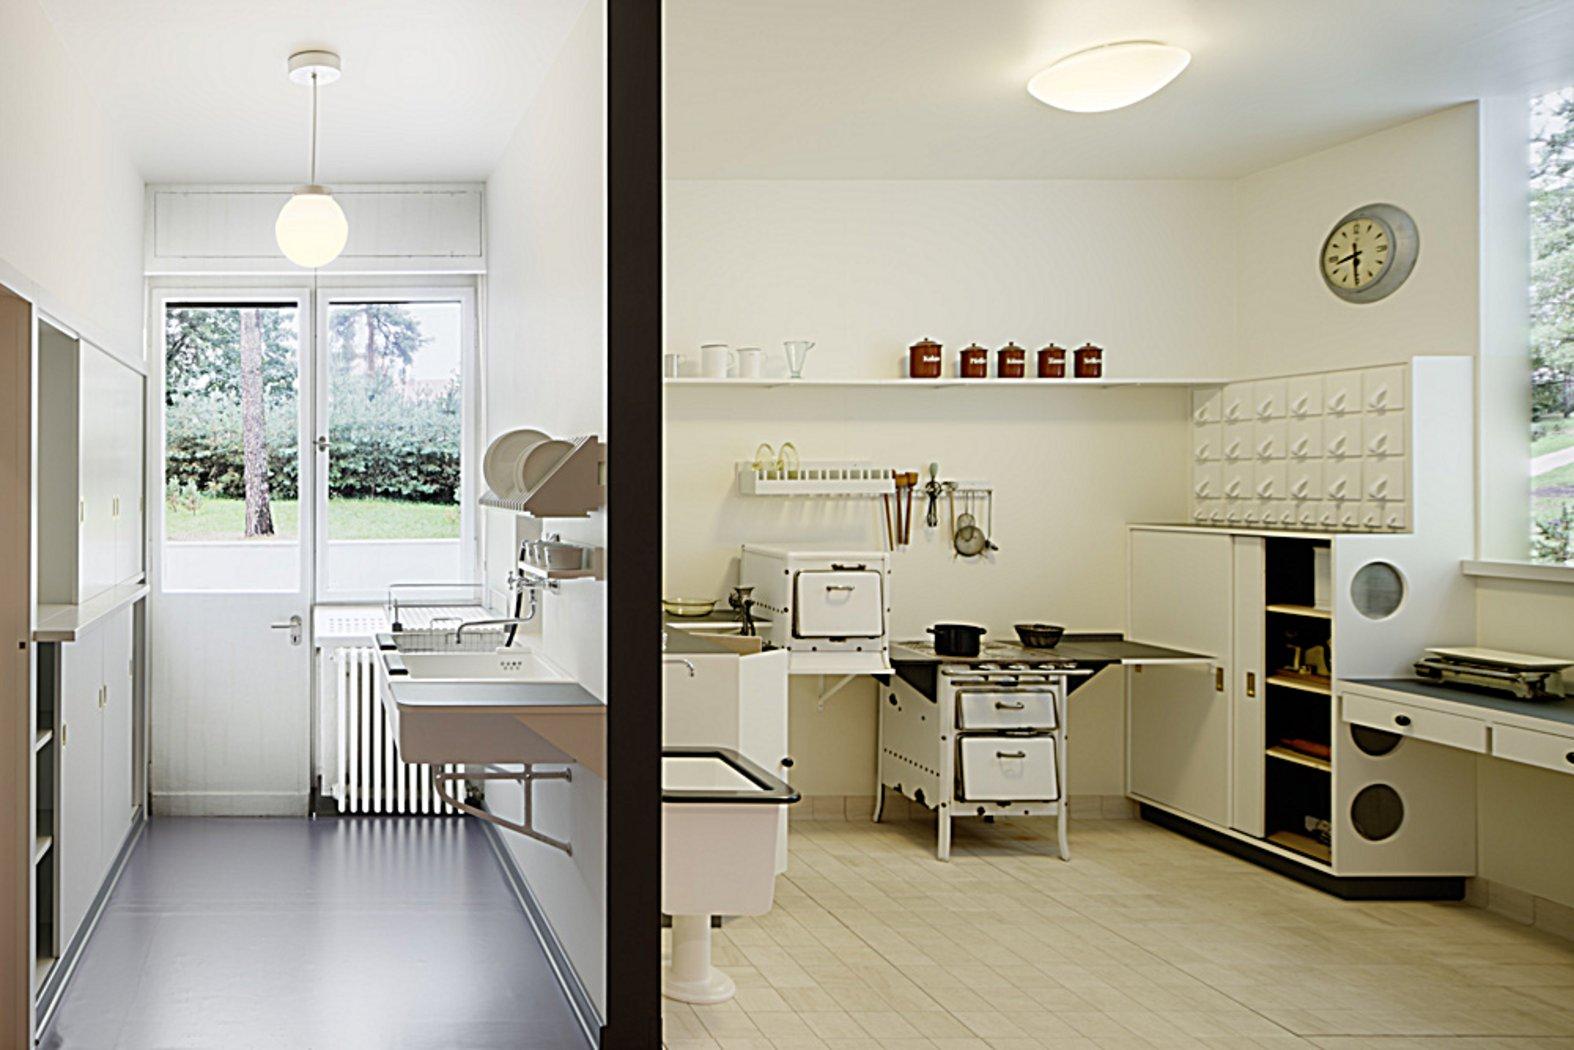 Full Size of Bauhaus Kuchen Fenster Wohnzimmer Bauhaus Küchenrückwand